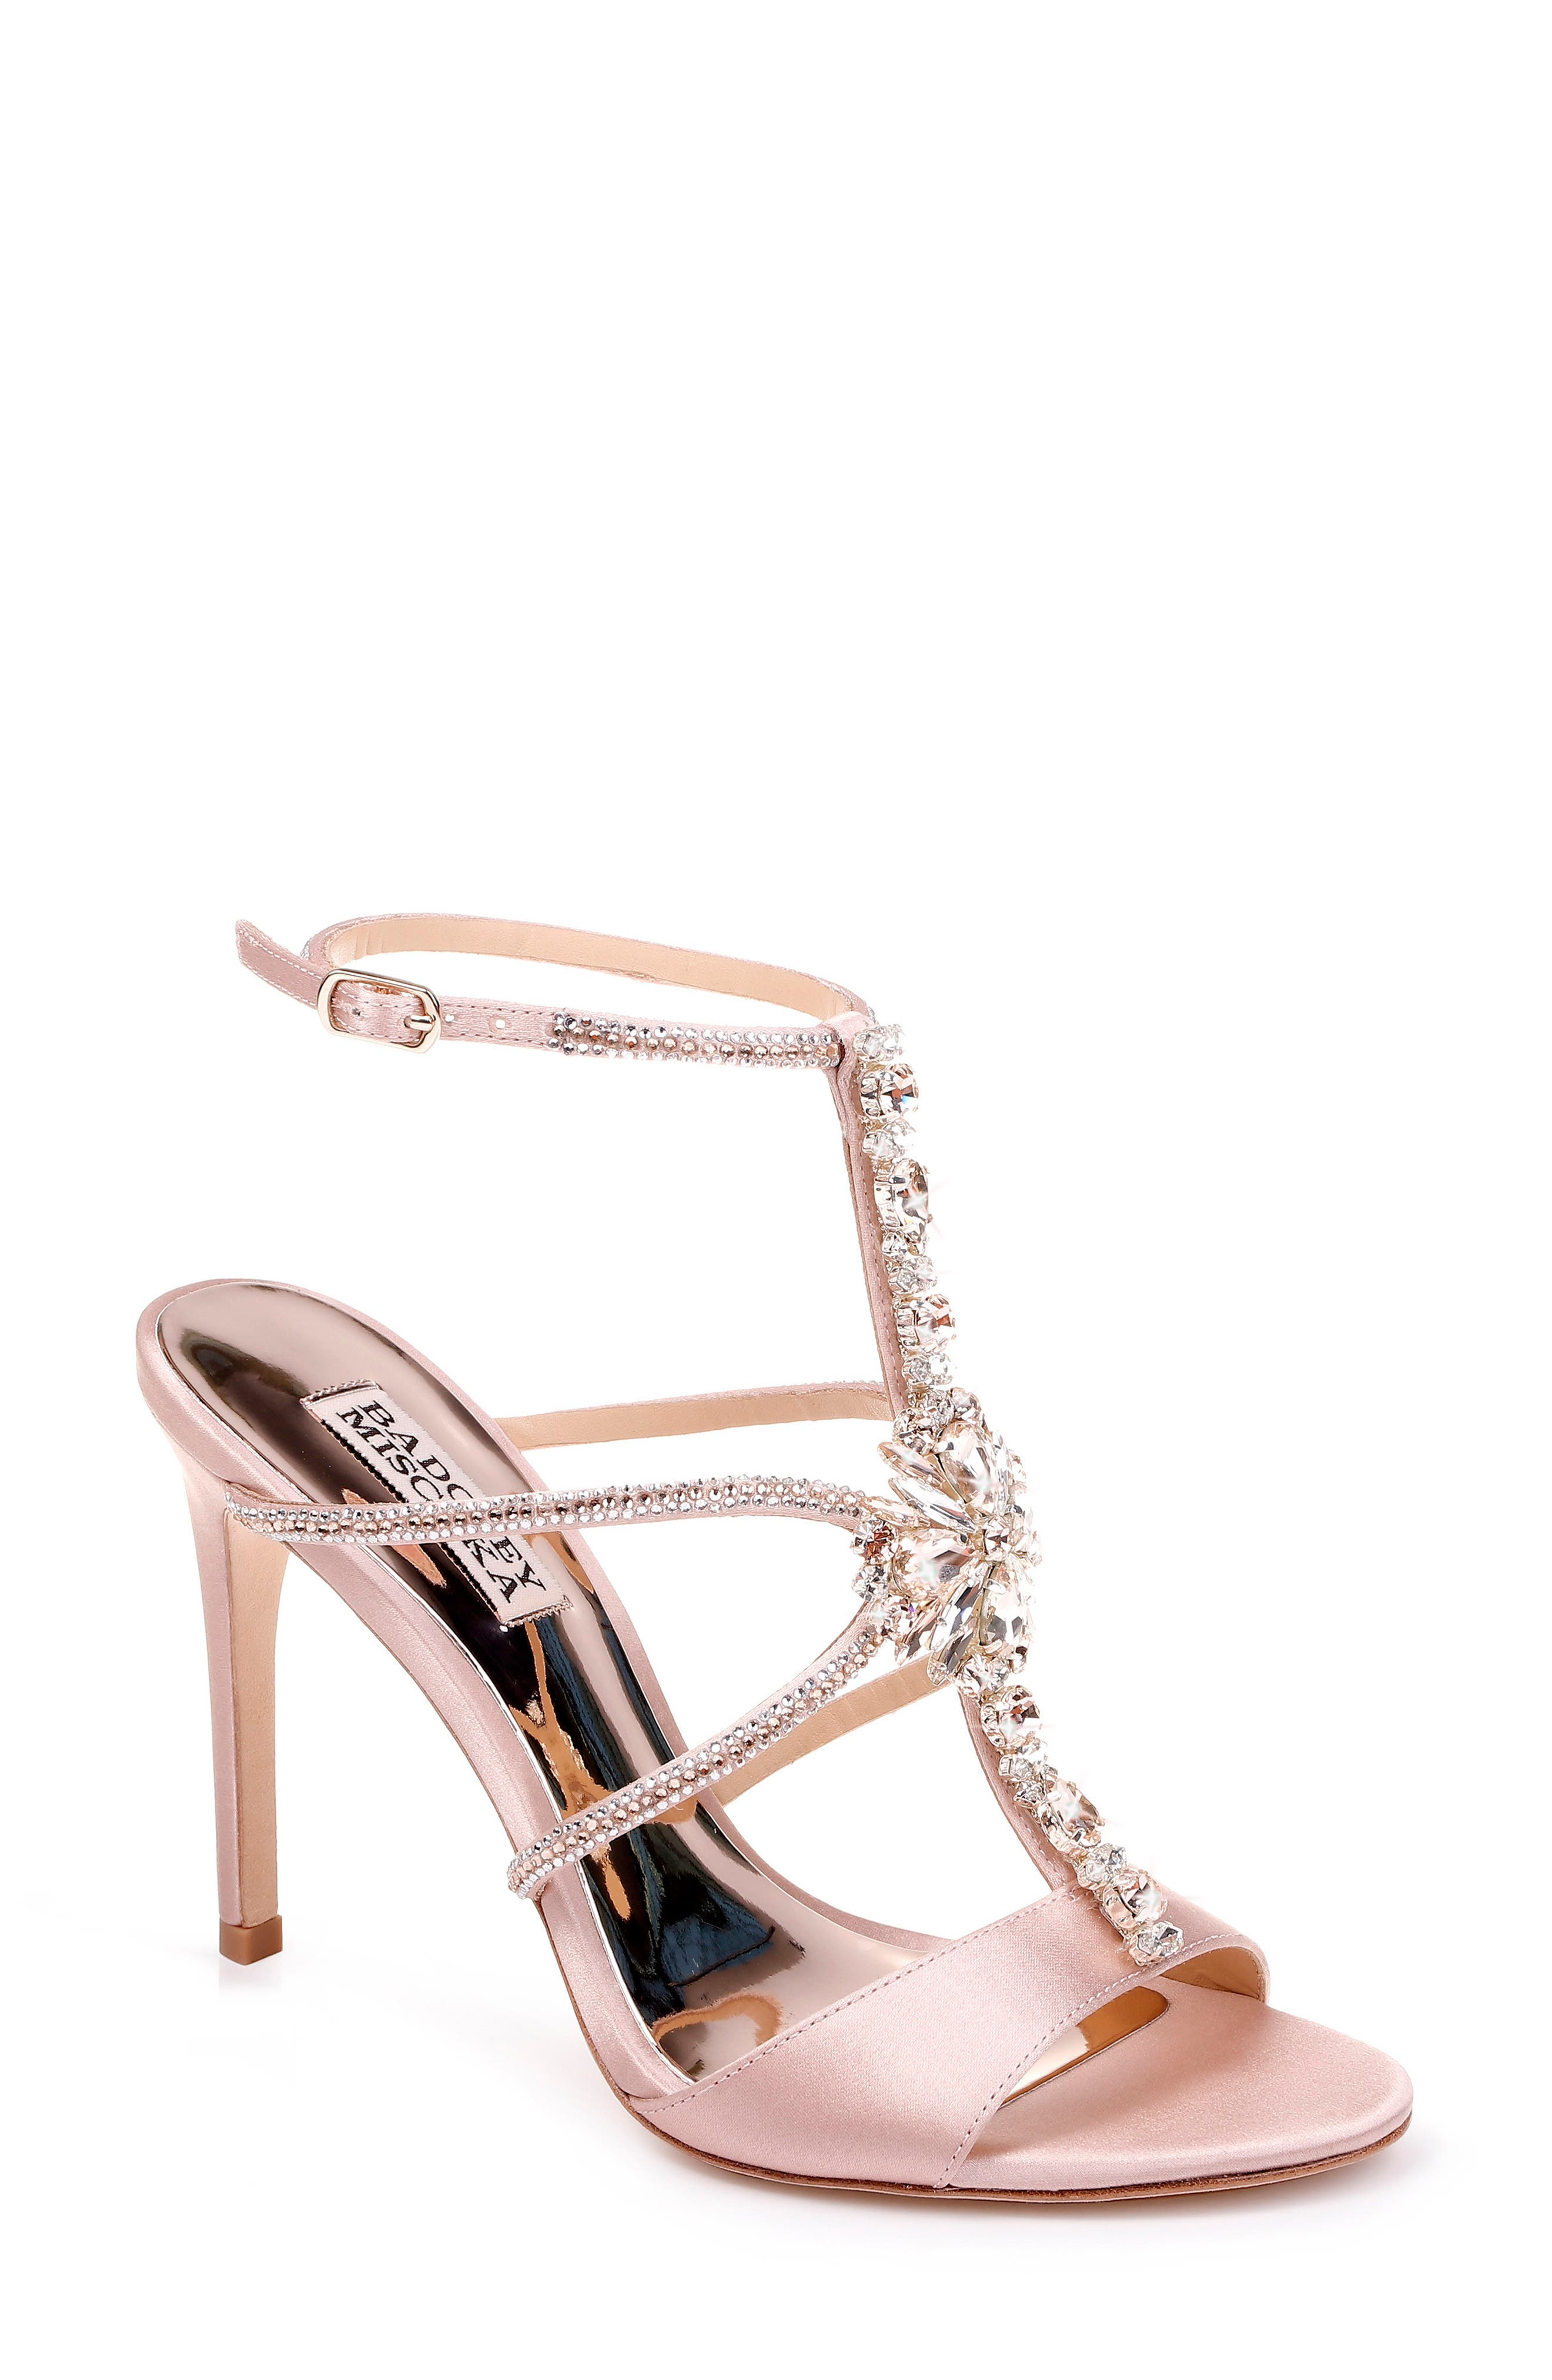 Badgley Mischka Faye Ankle Strap Sandal, Pink